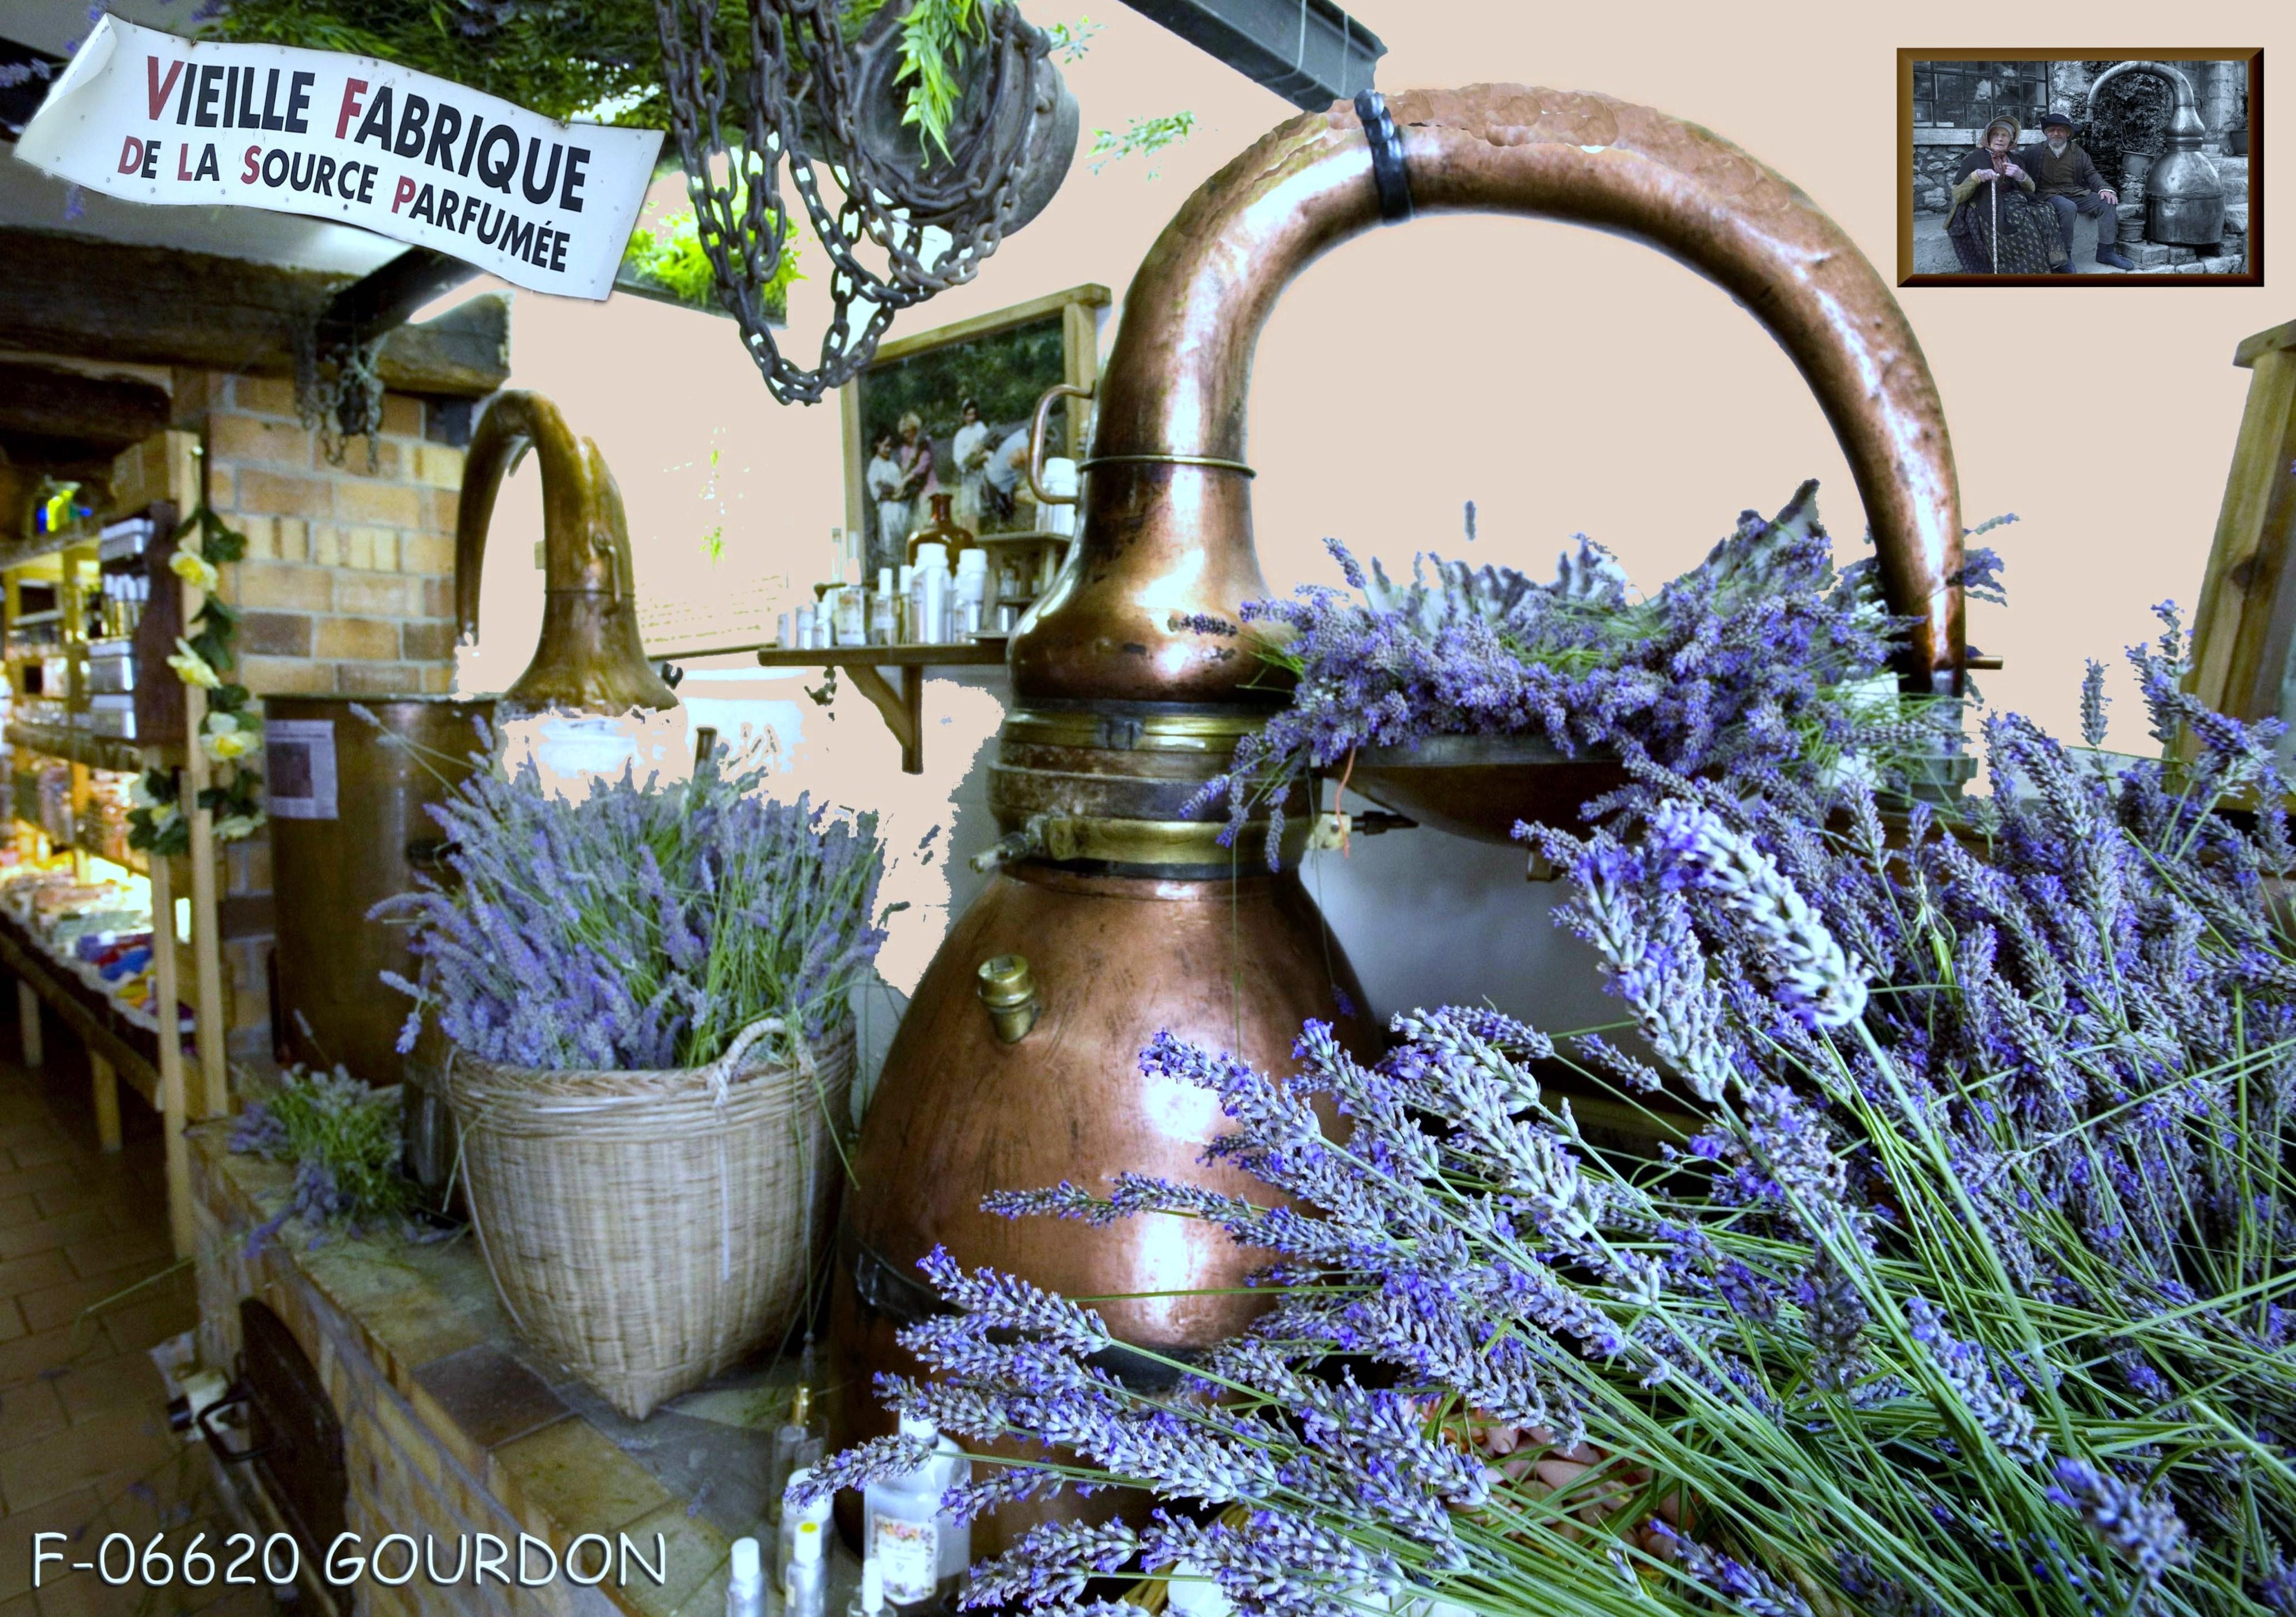 Příběh parfumerie Galimard